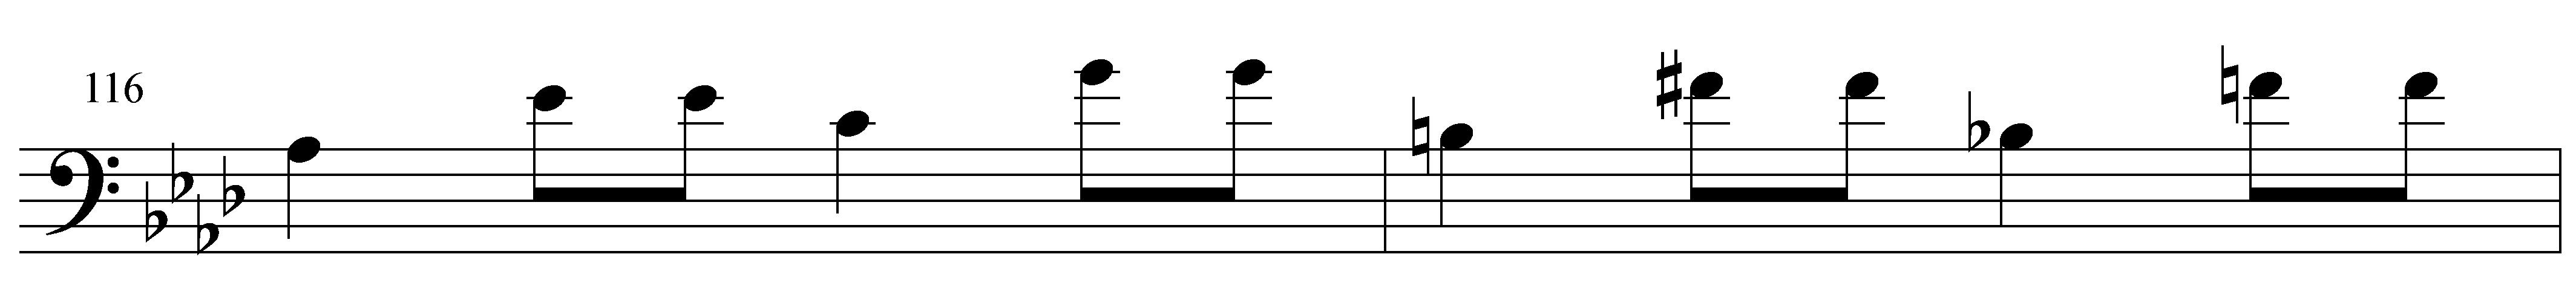 Riff-1-3-2-b2